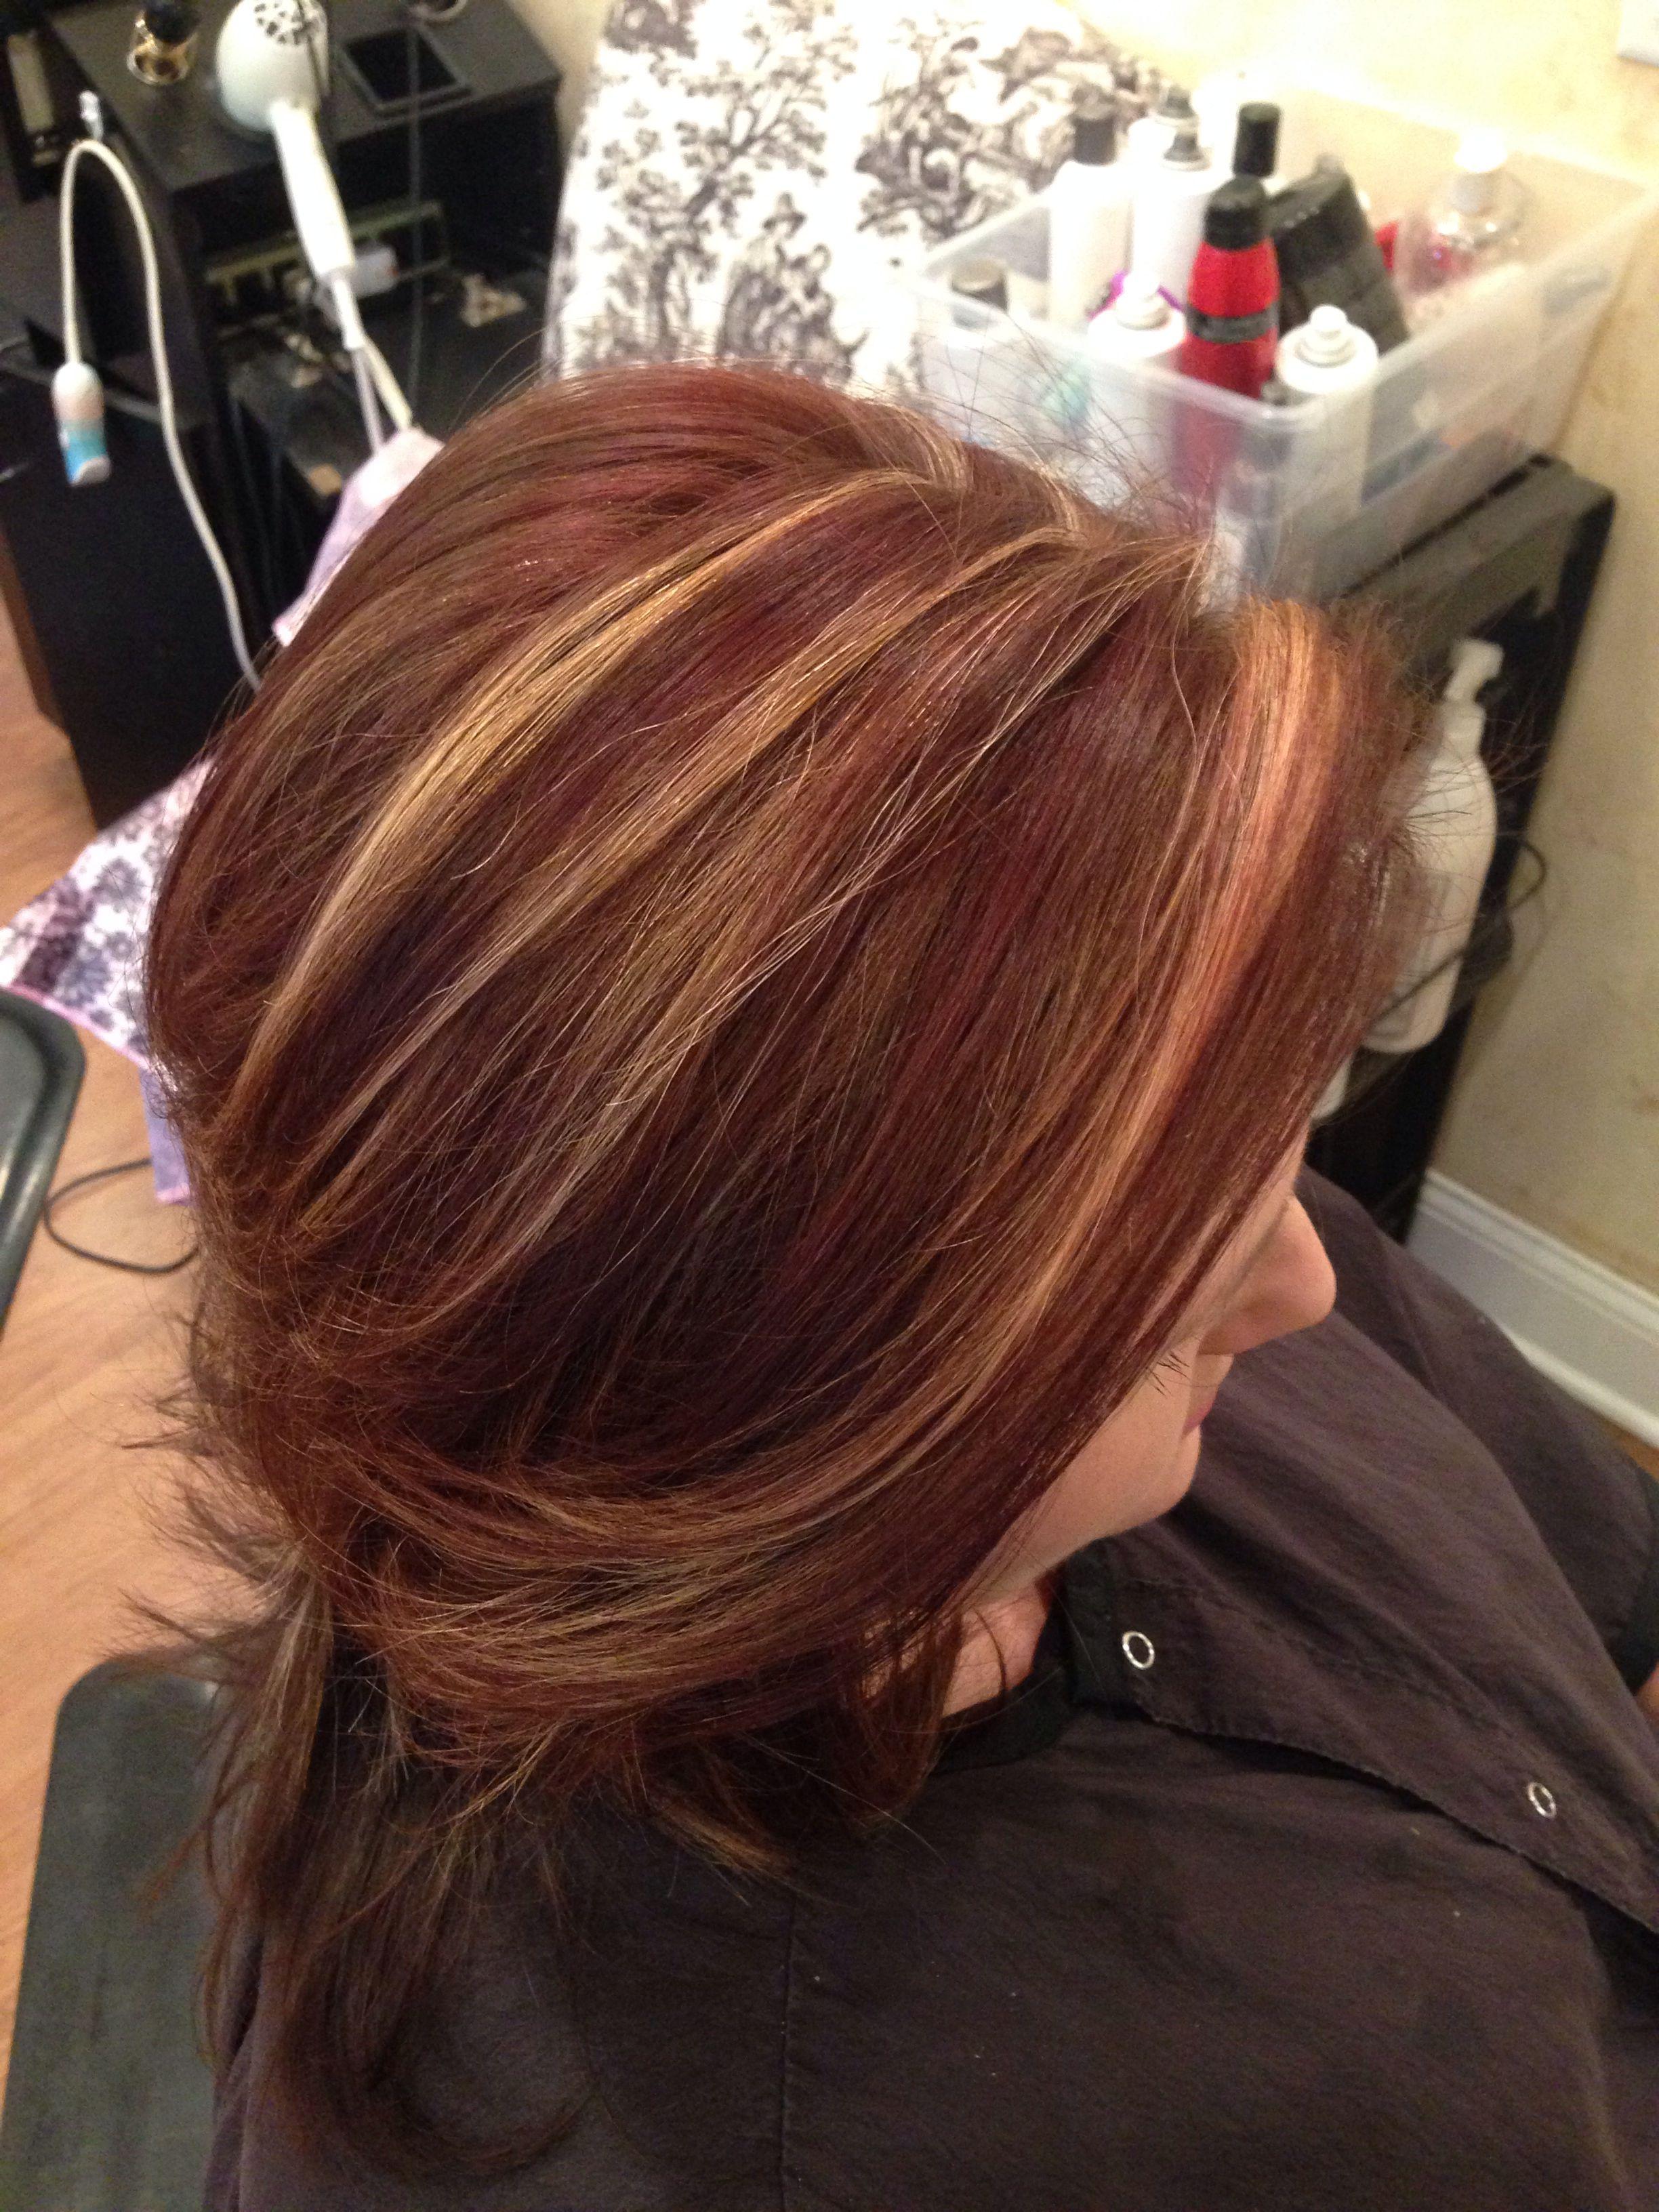 Warm blonde chunks with racing red and chocolate lowlights Hair